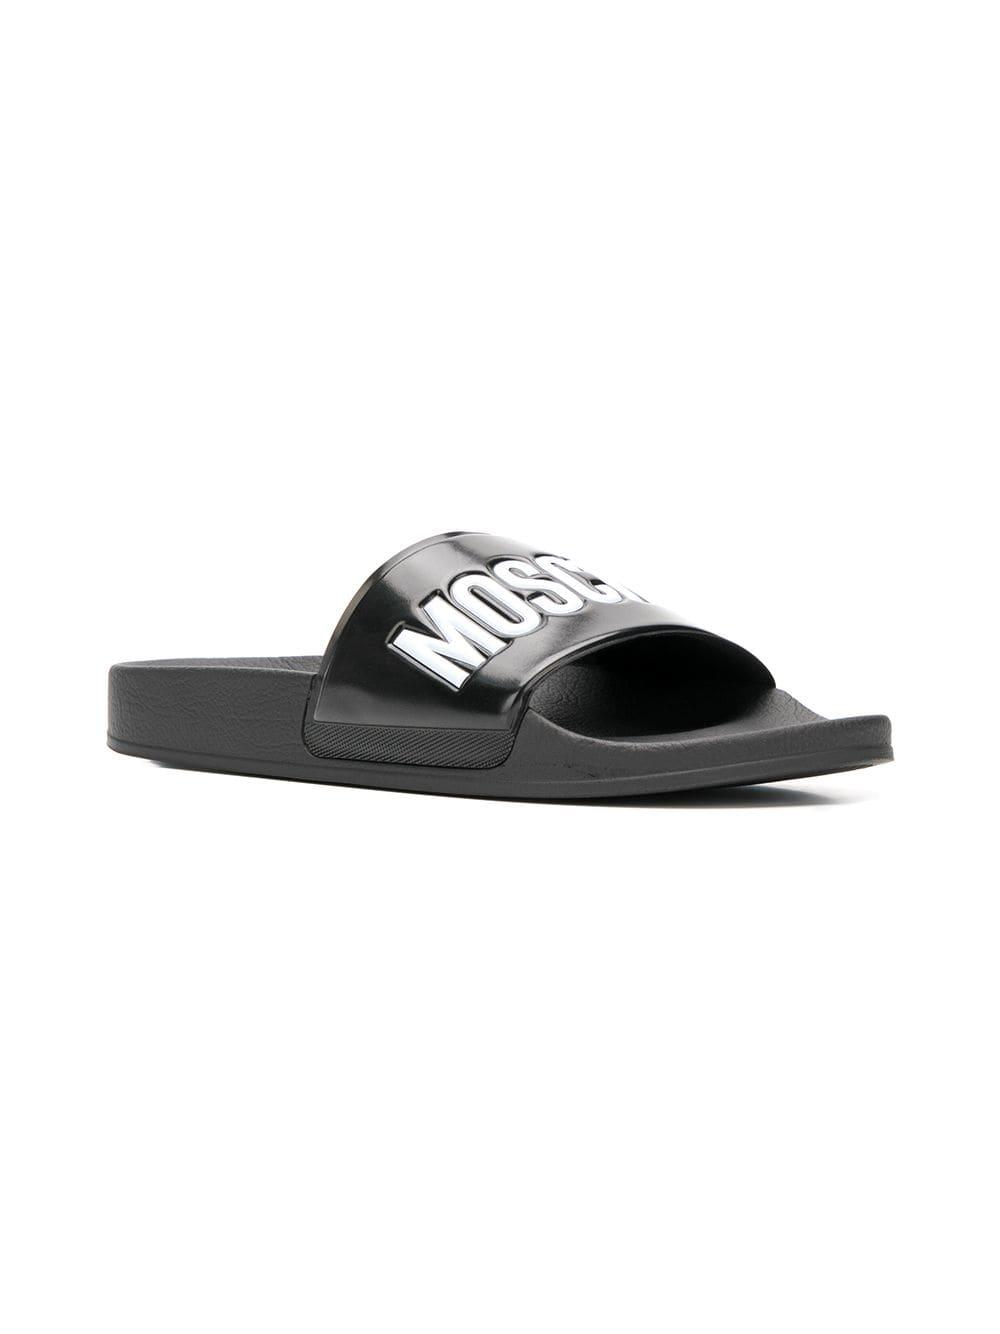 232e16168e07e Lyst - Moschino Black Slides With Logo in Black for Men - Save 50%